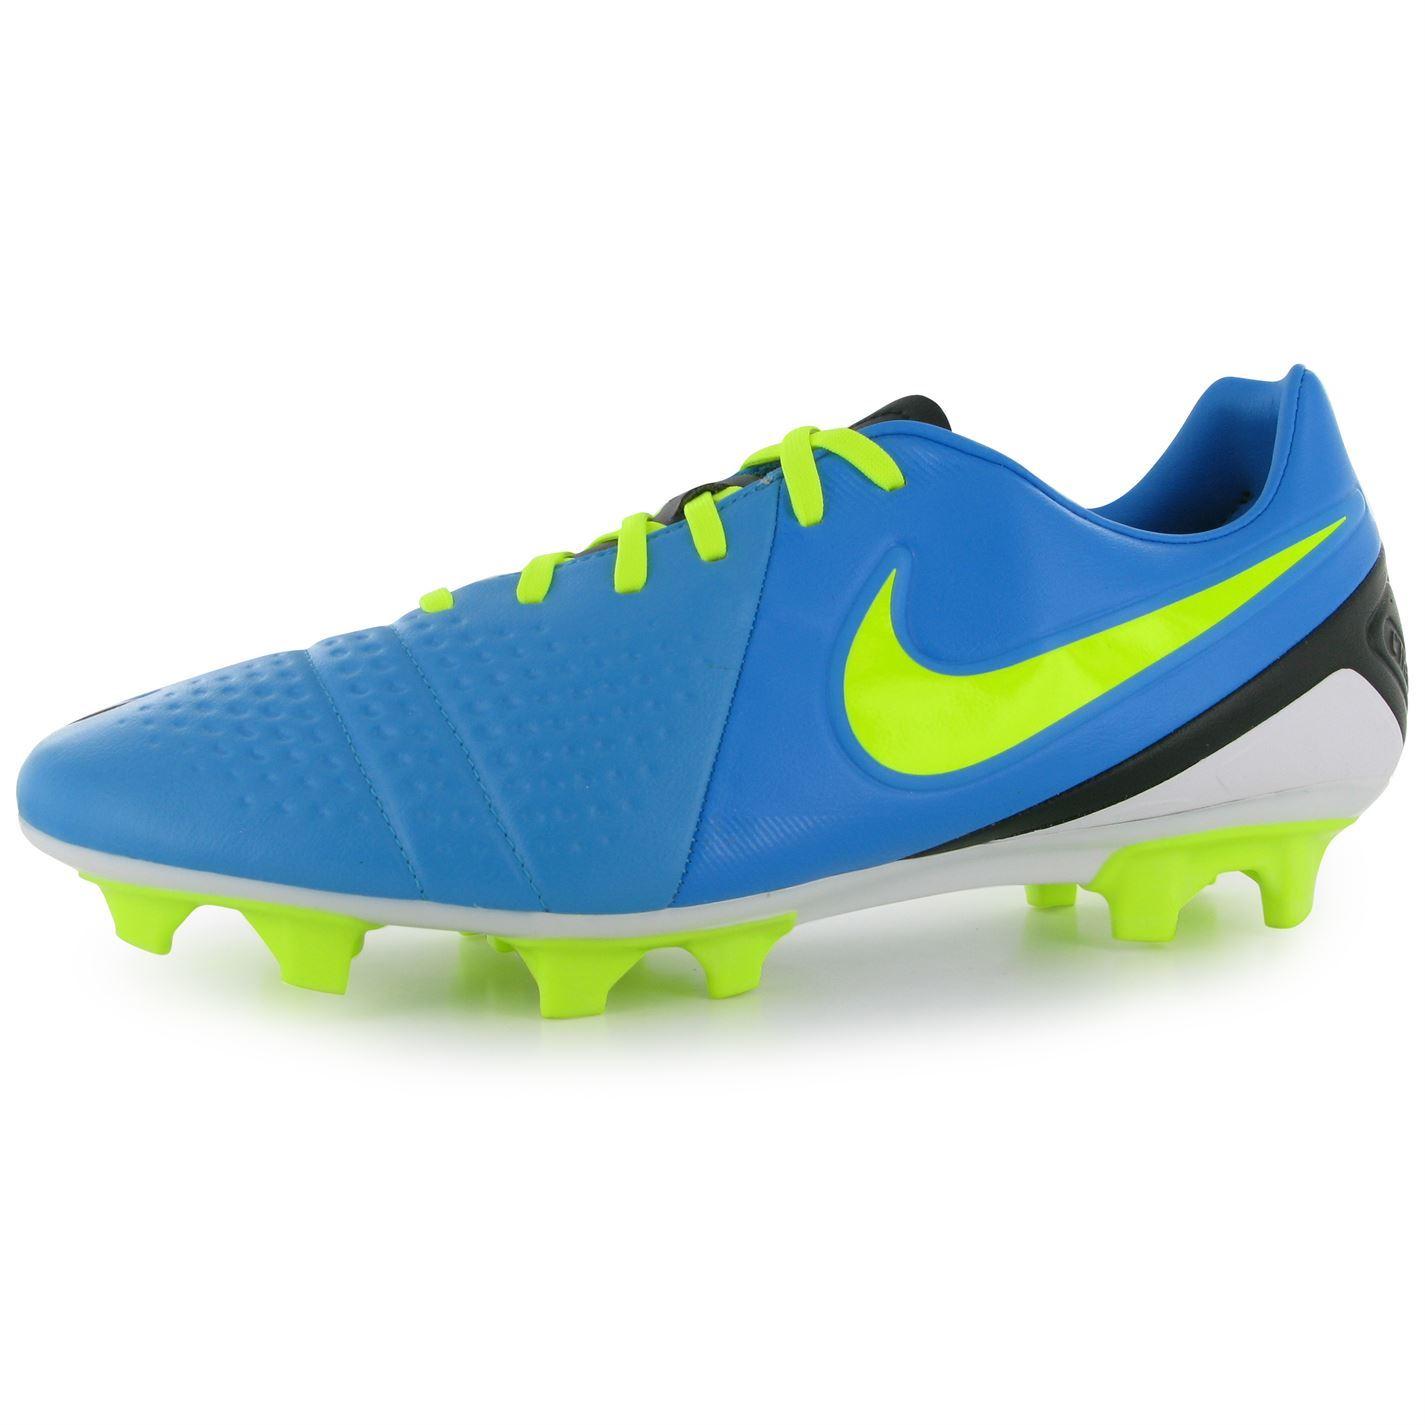 nike ctr360 trequartista iii fg mens football boots 28